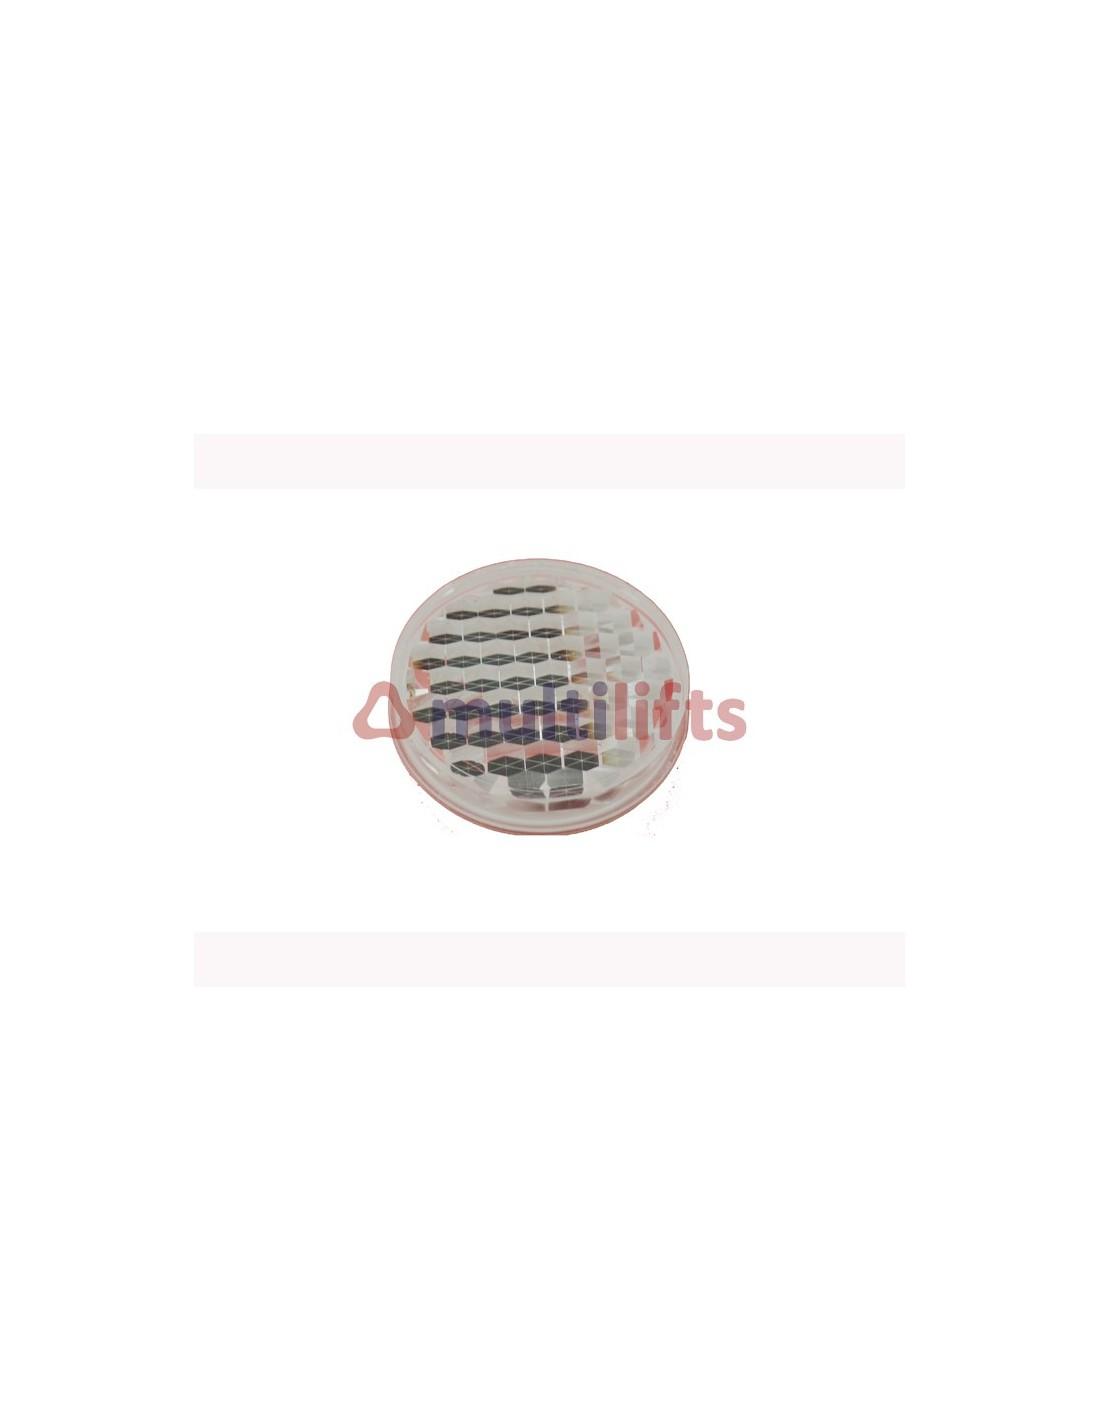 Espejo adhesivo diametro 35 0x5 5 er692 multilifts - Espejo adhesivo ...